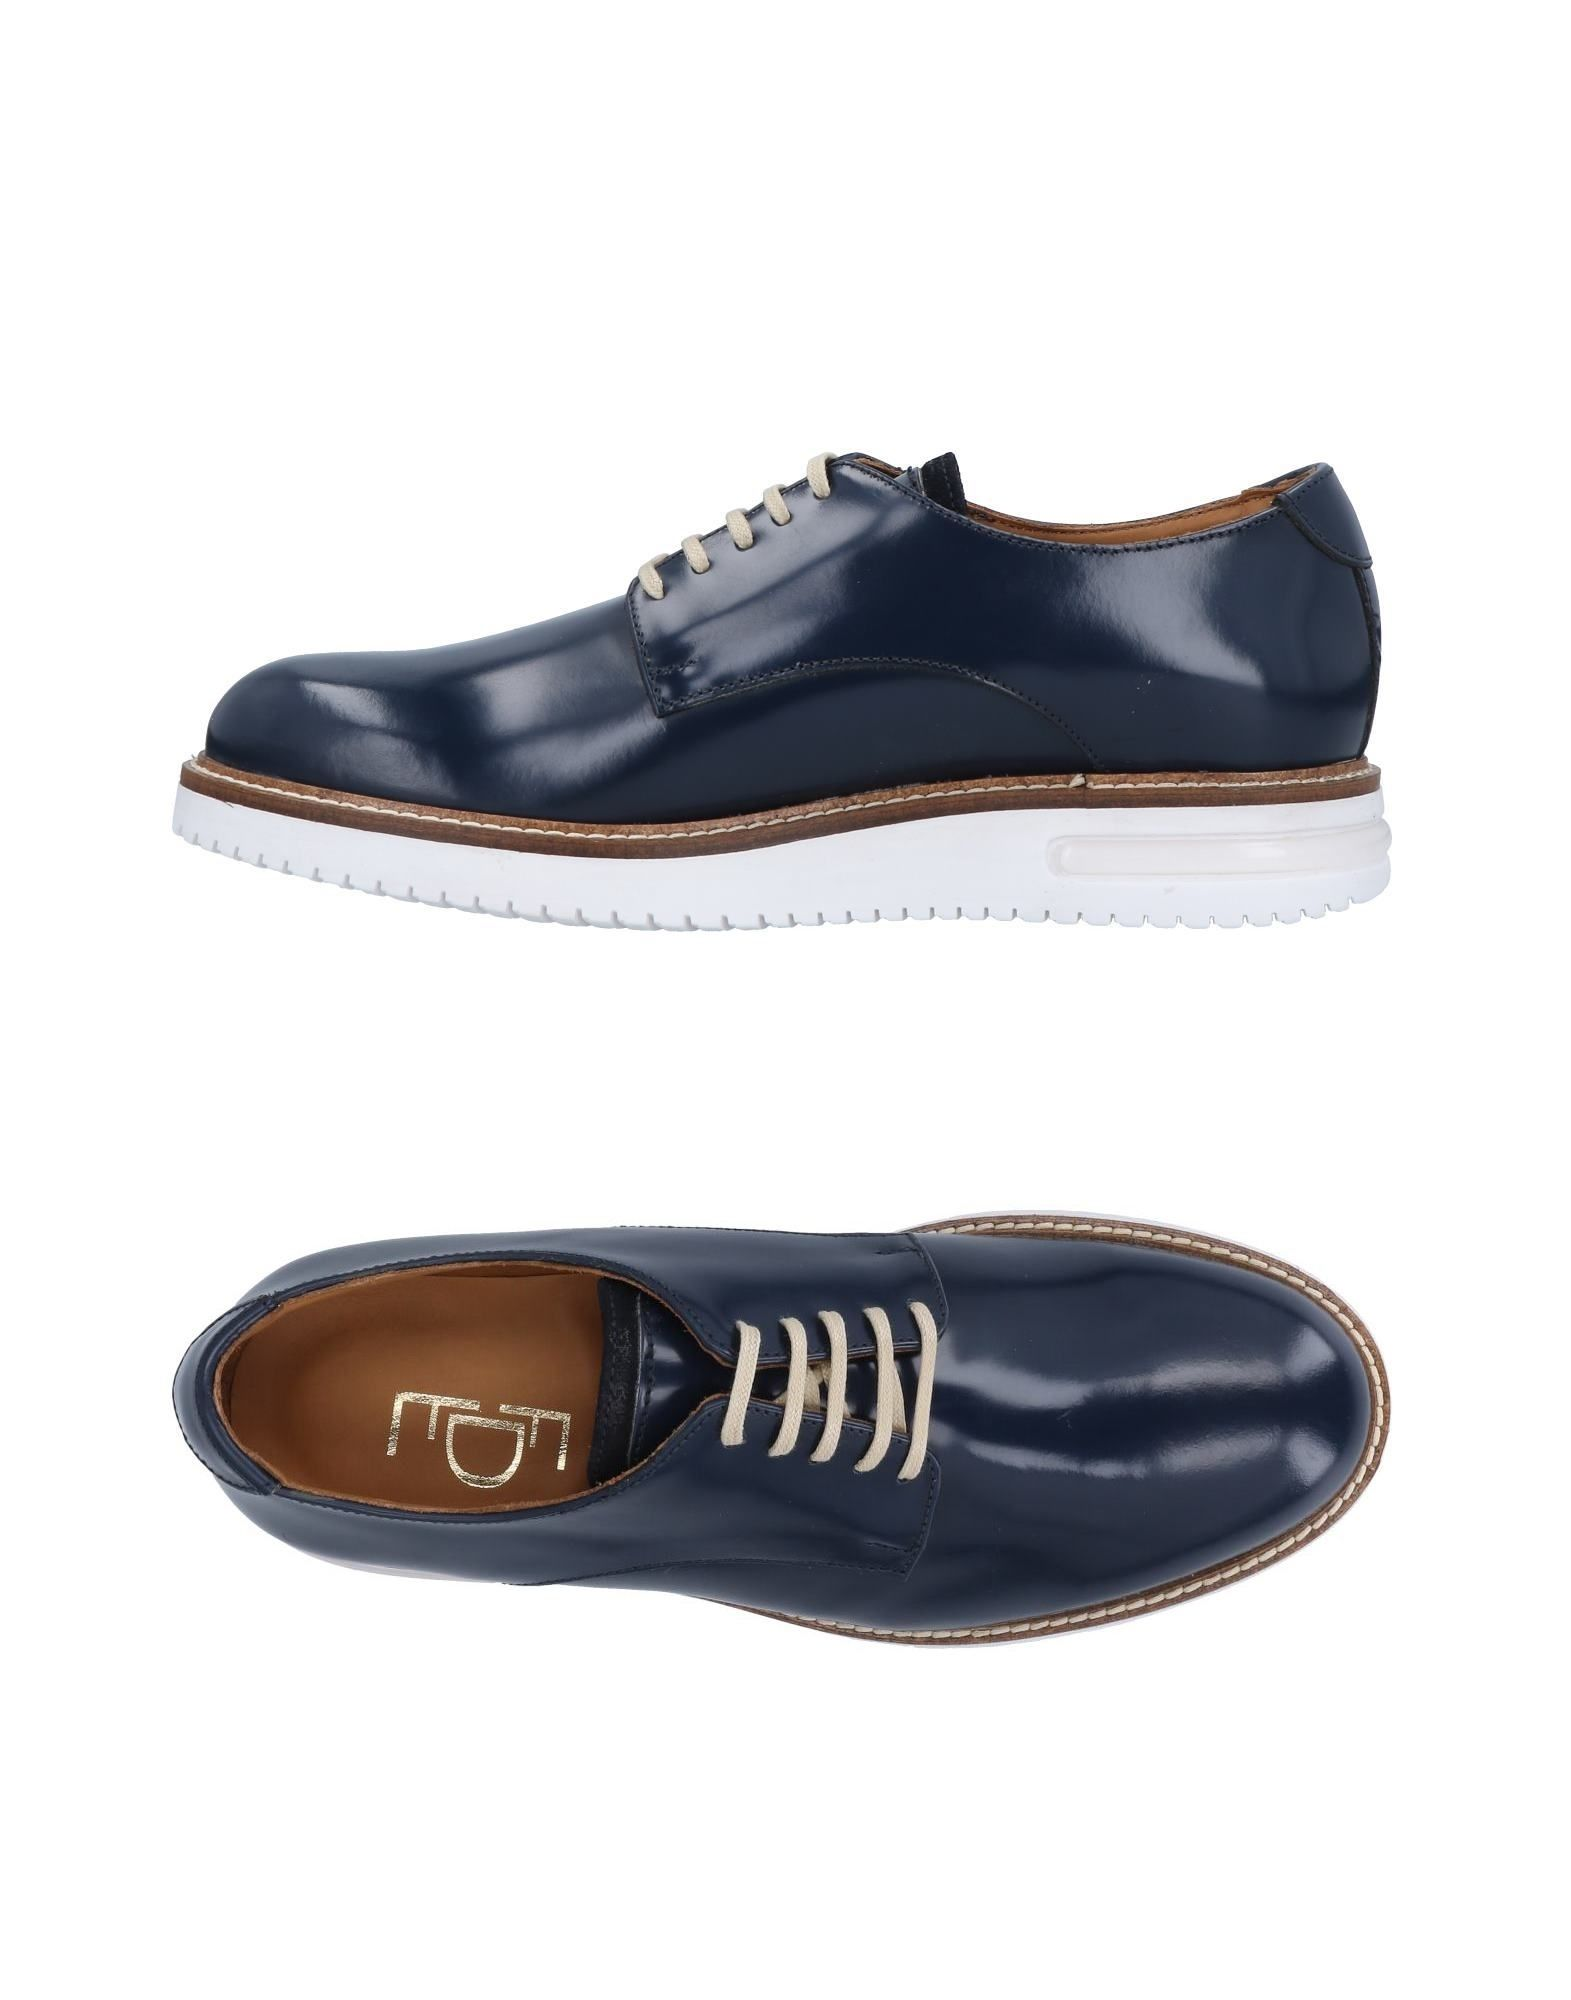 Stringate Fdf Shoes Uomo - 11419823JH